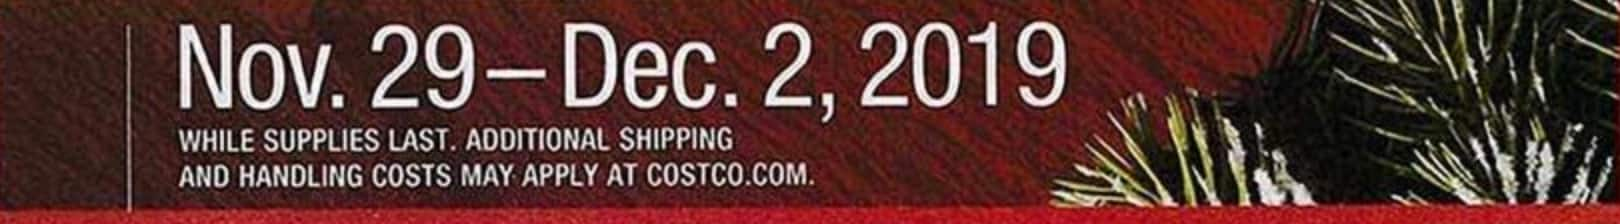 Costco Black Friday 2019